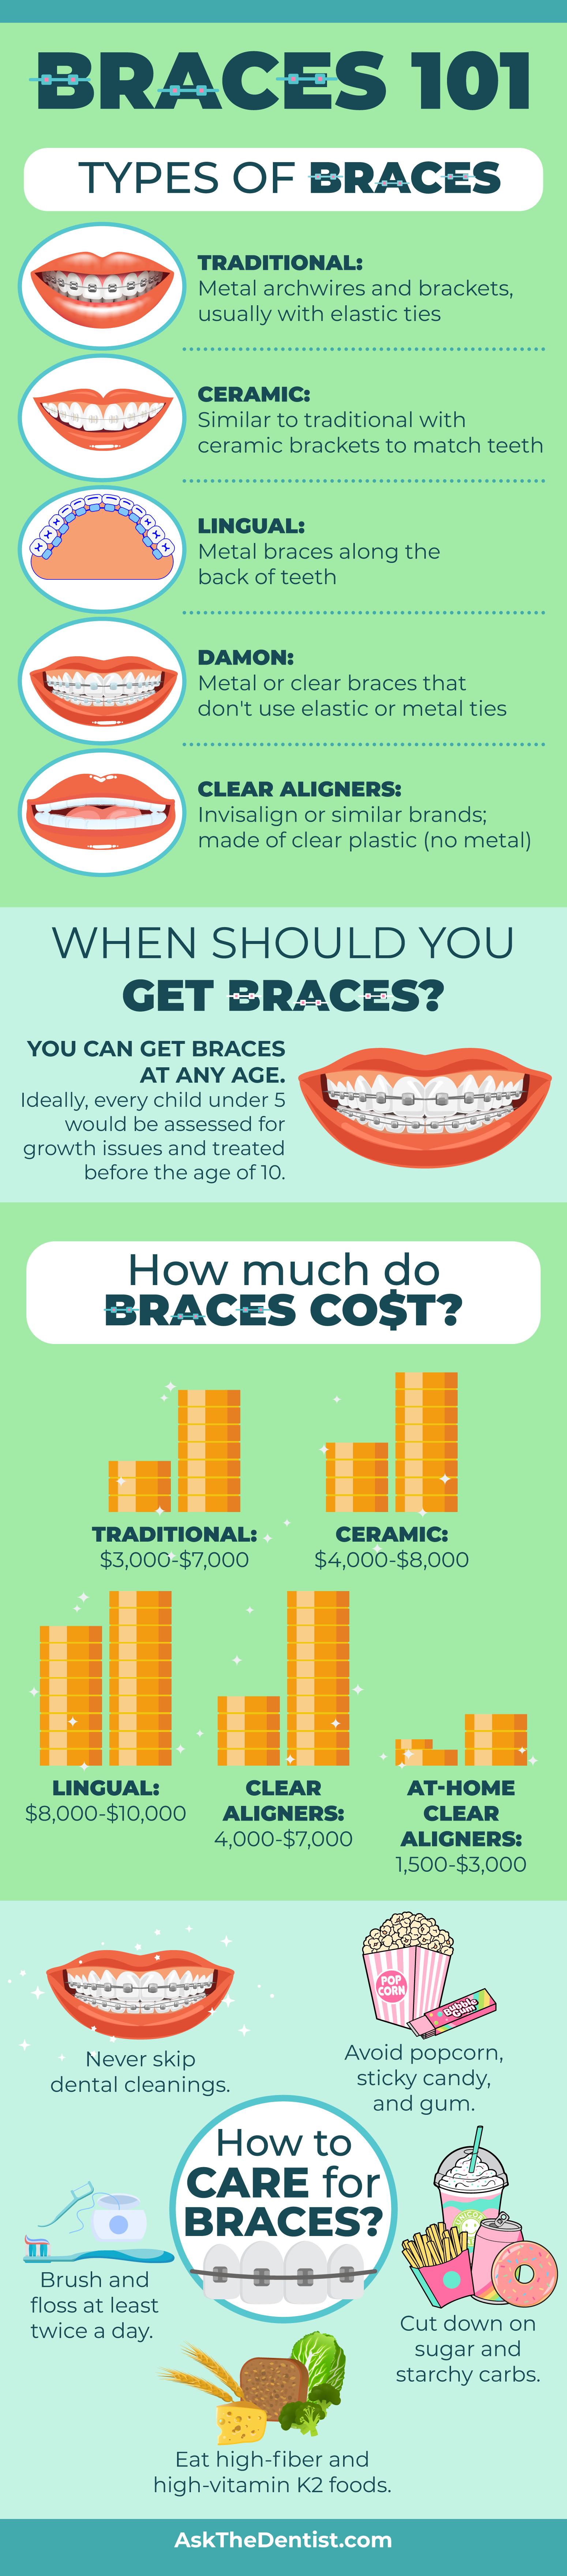 braces-types-costs-treatment